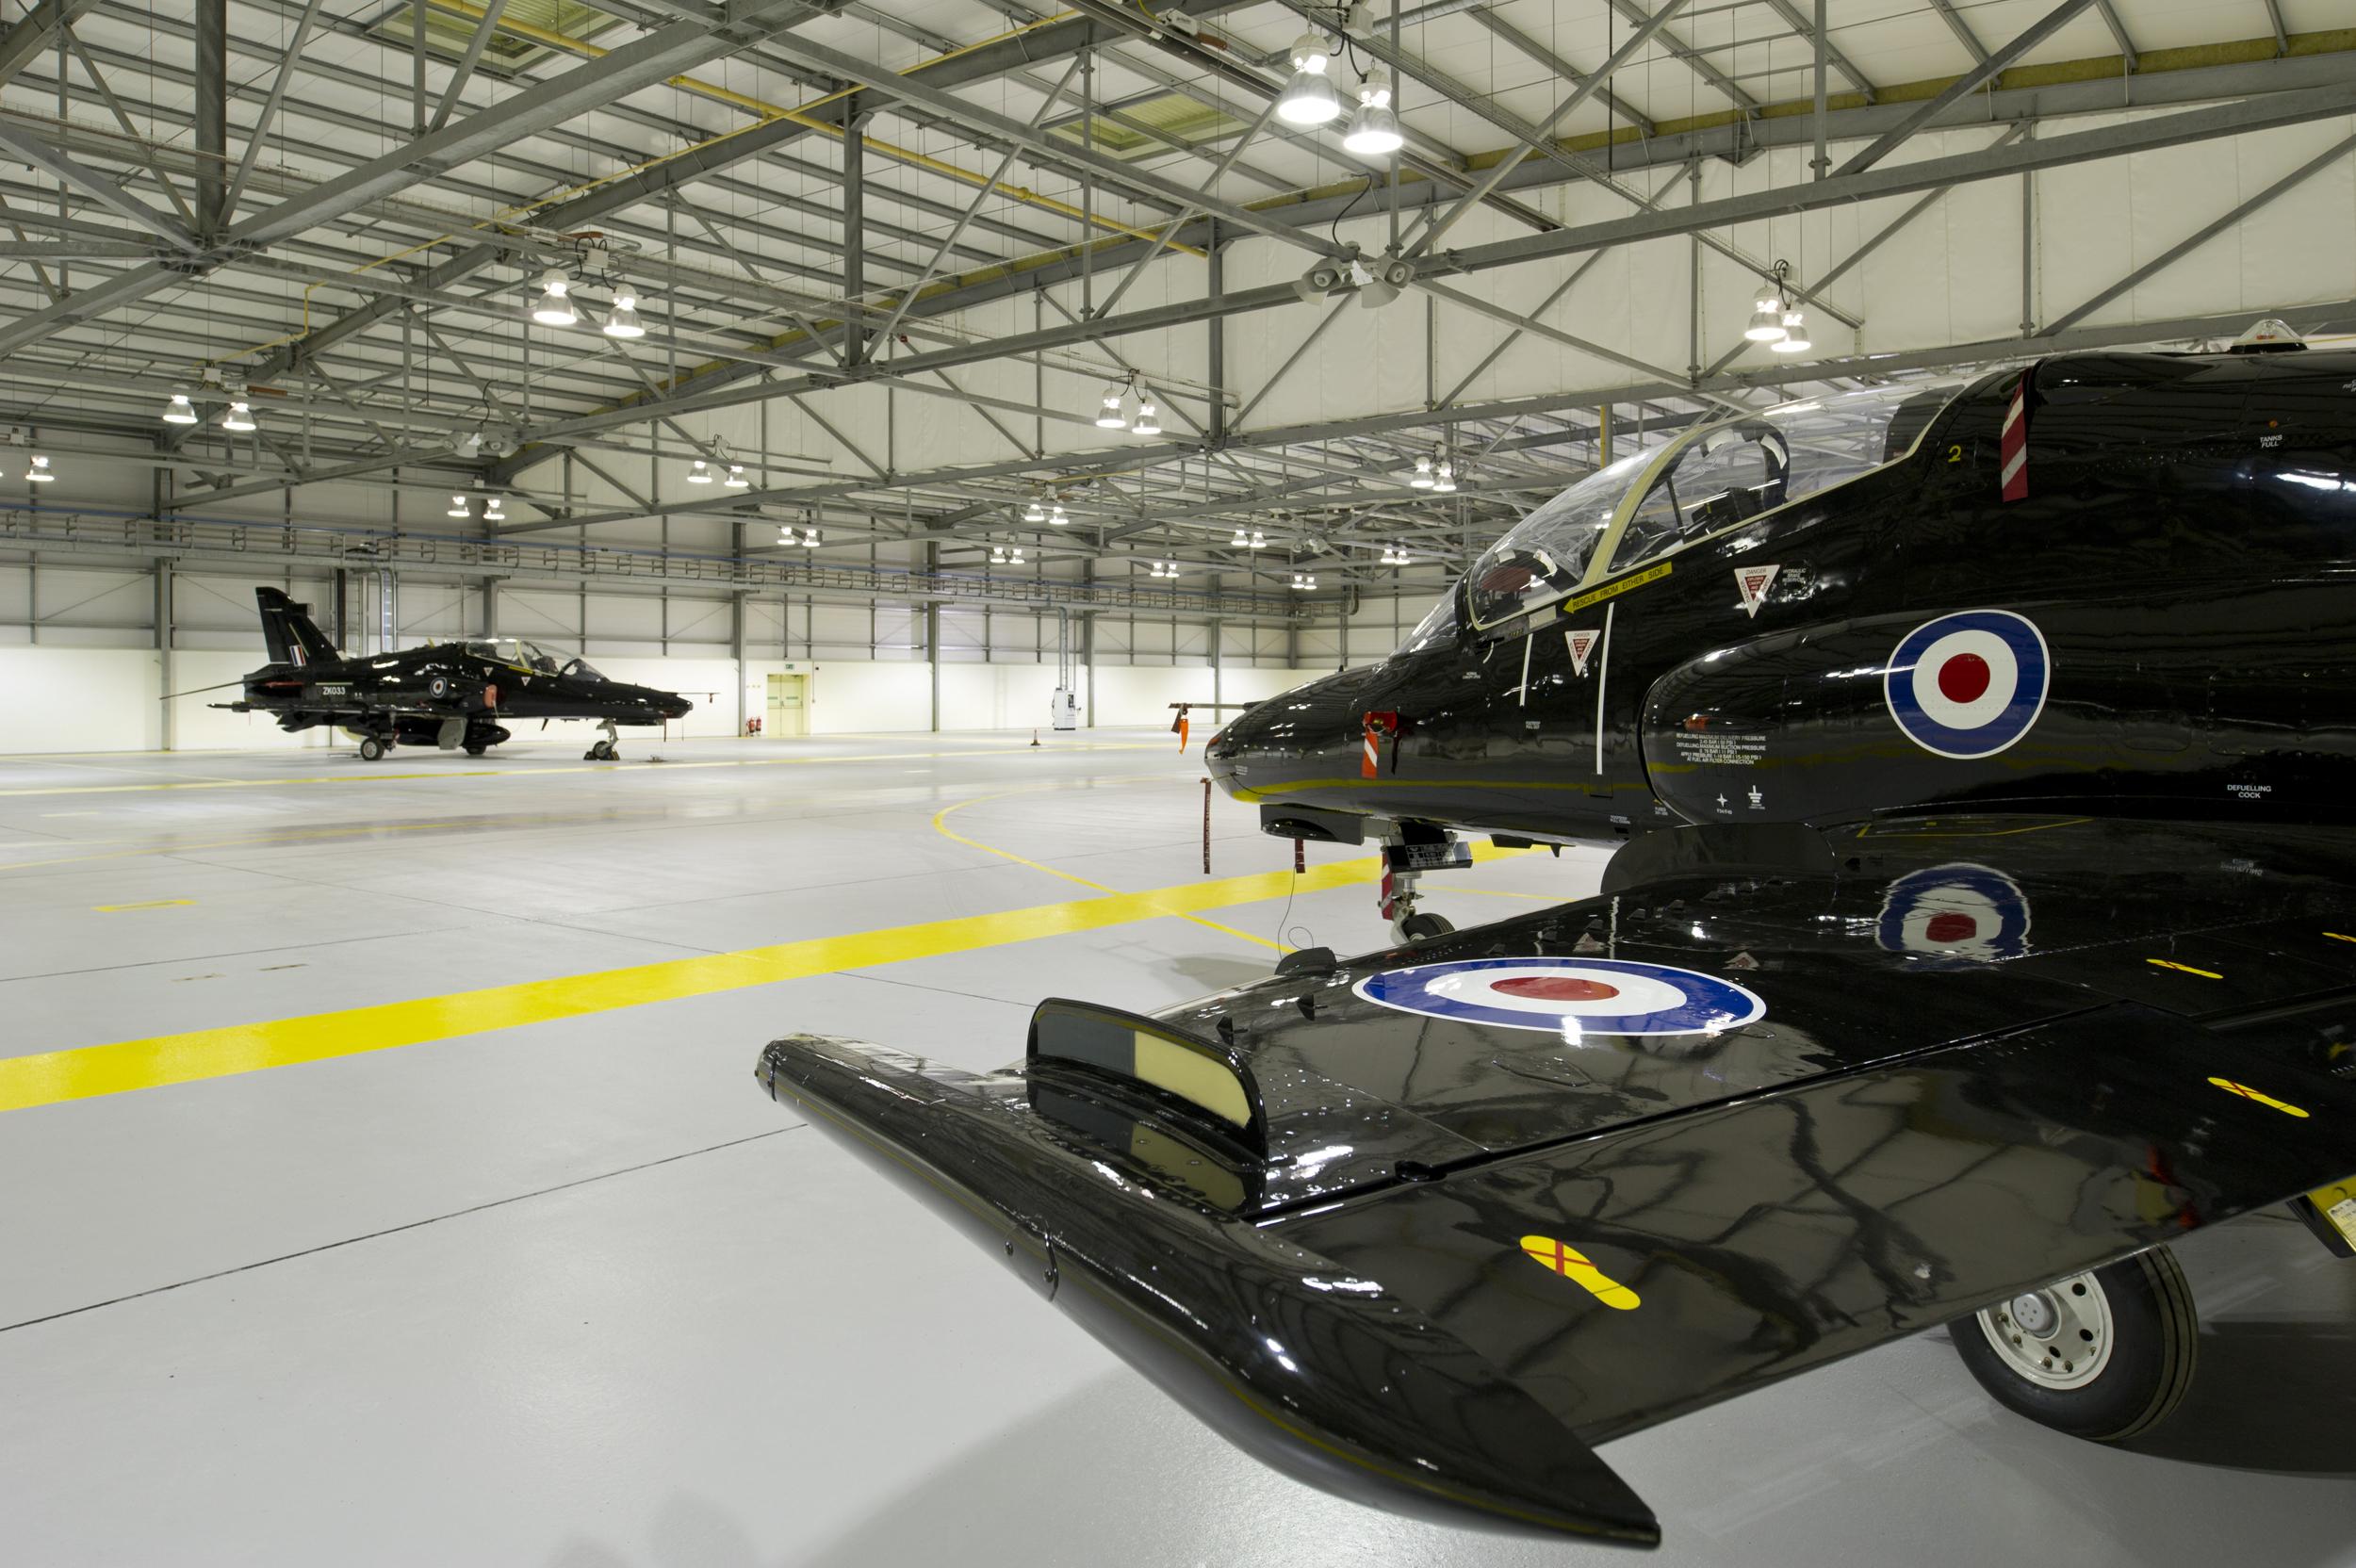 RAF Valley Aircraft Hanger